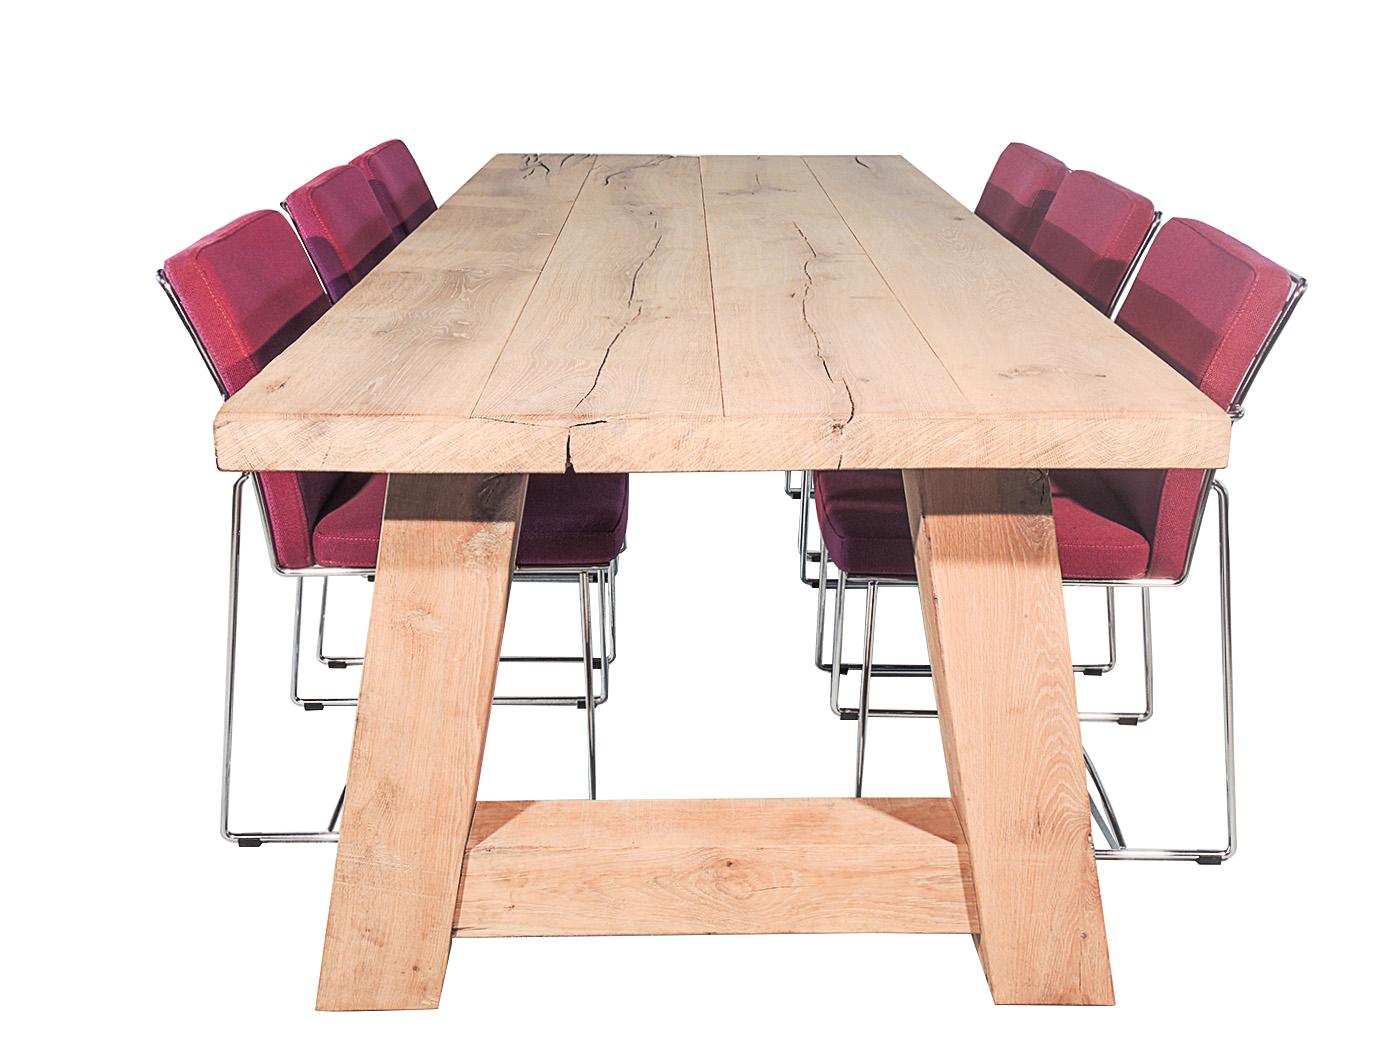 Robuuste Eiken Tafel : Eiken tafels meer stoeretafels